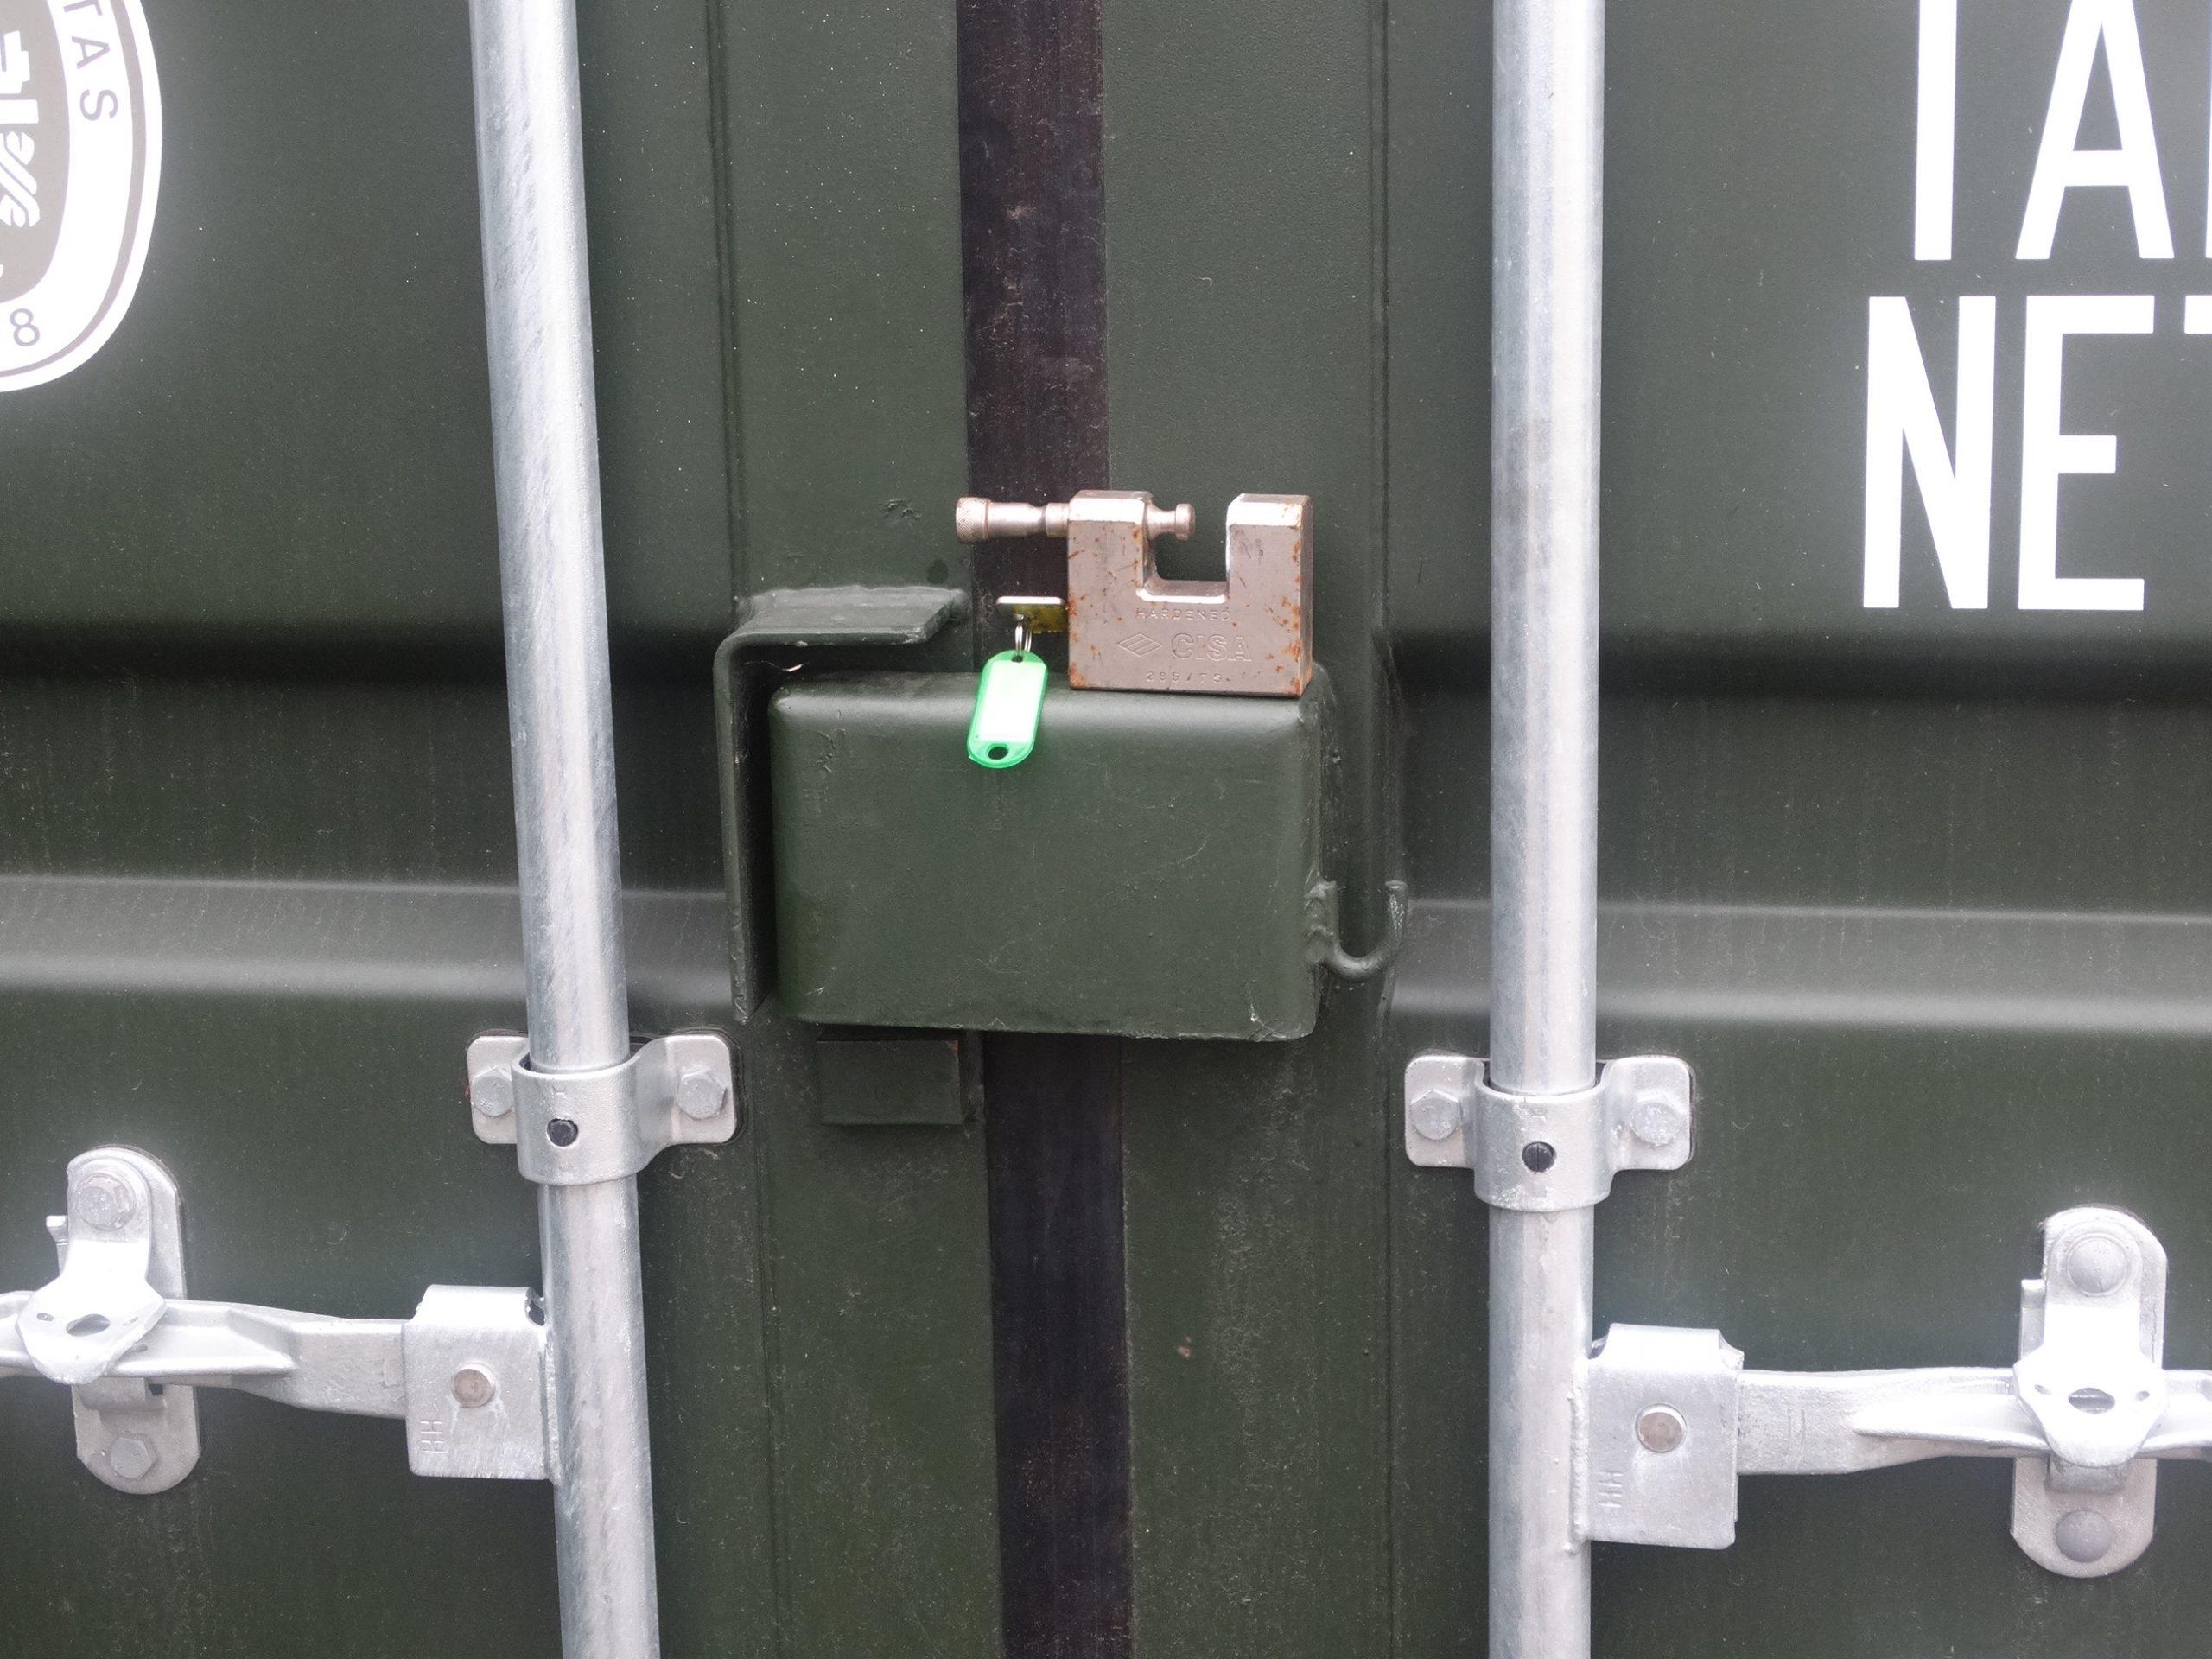 Squirrel Self Storage Ltd a storage company in Merritown Lane, Christchurch, UK